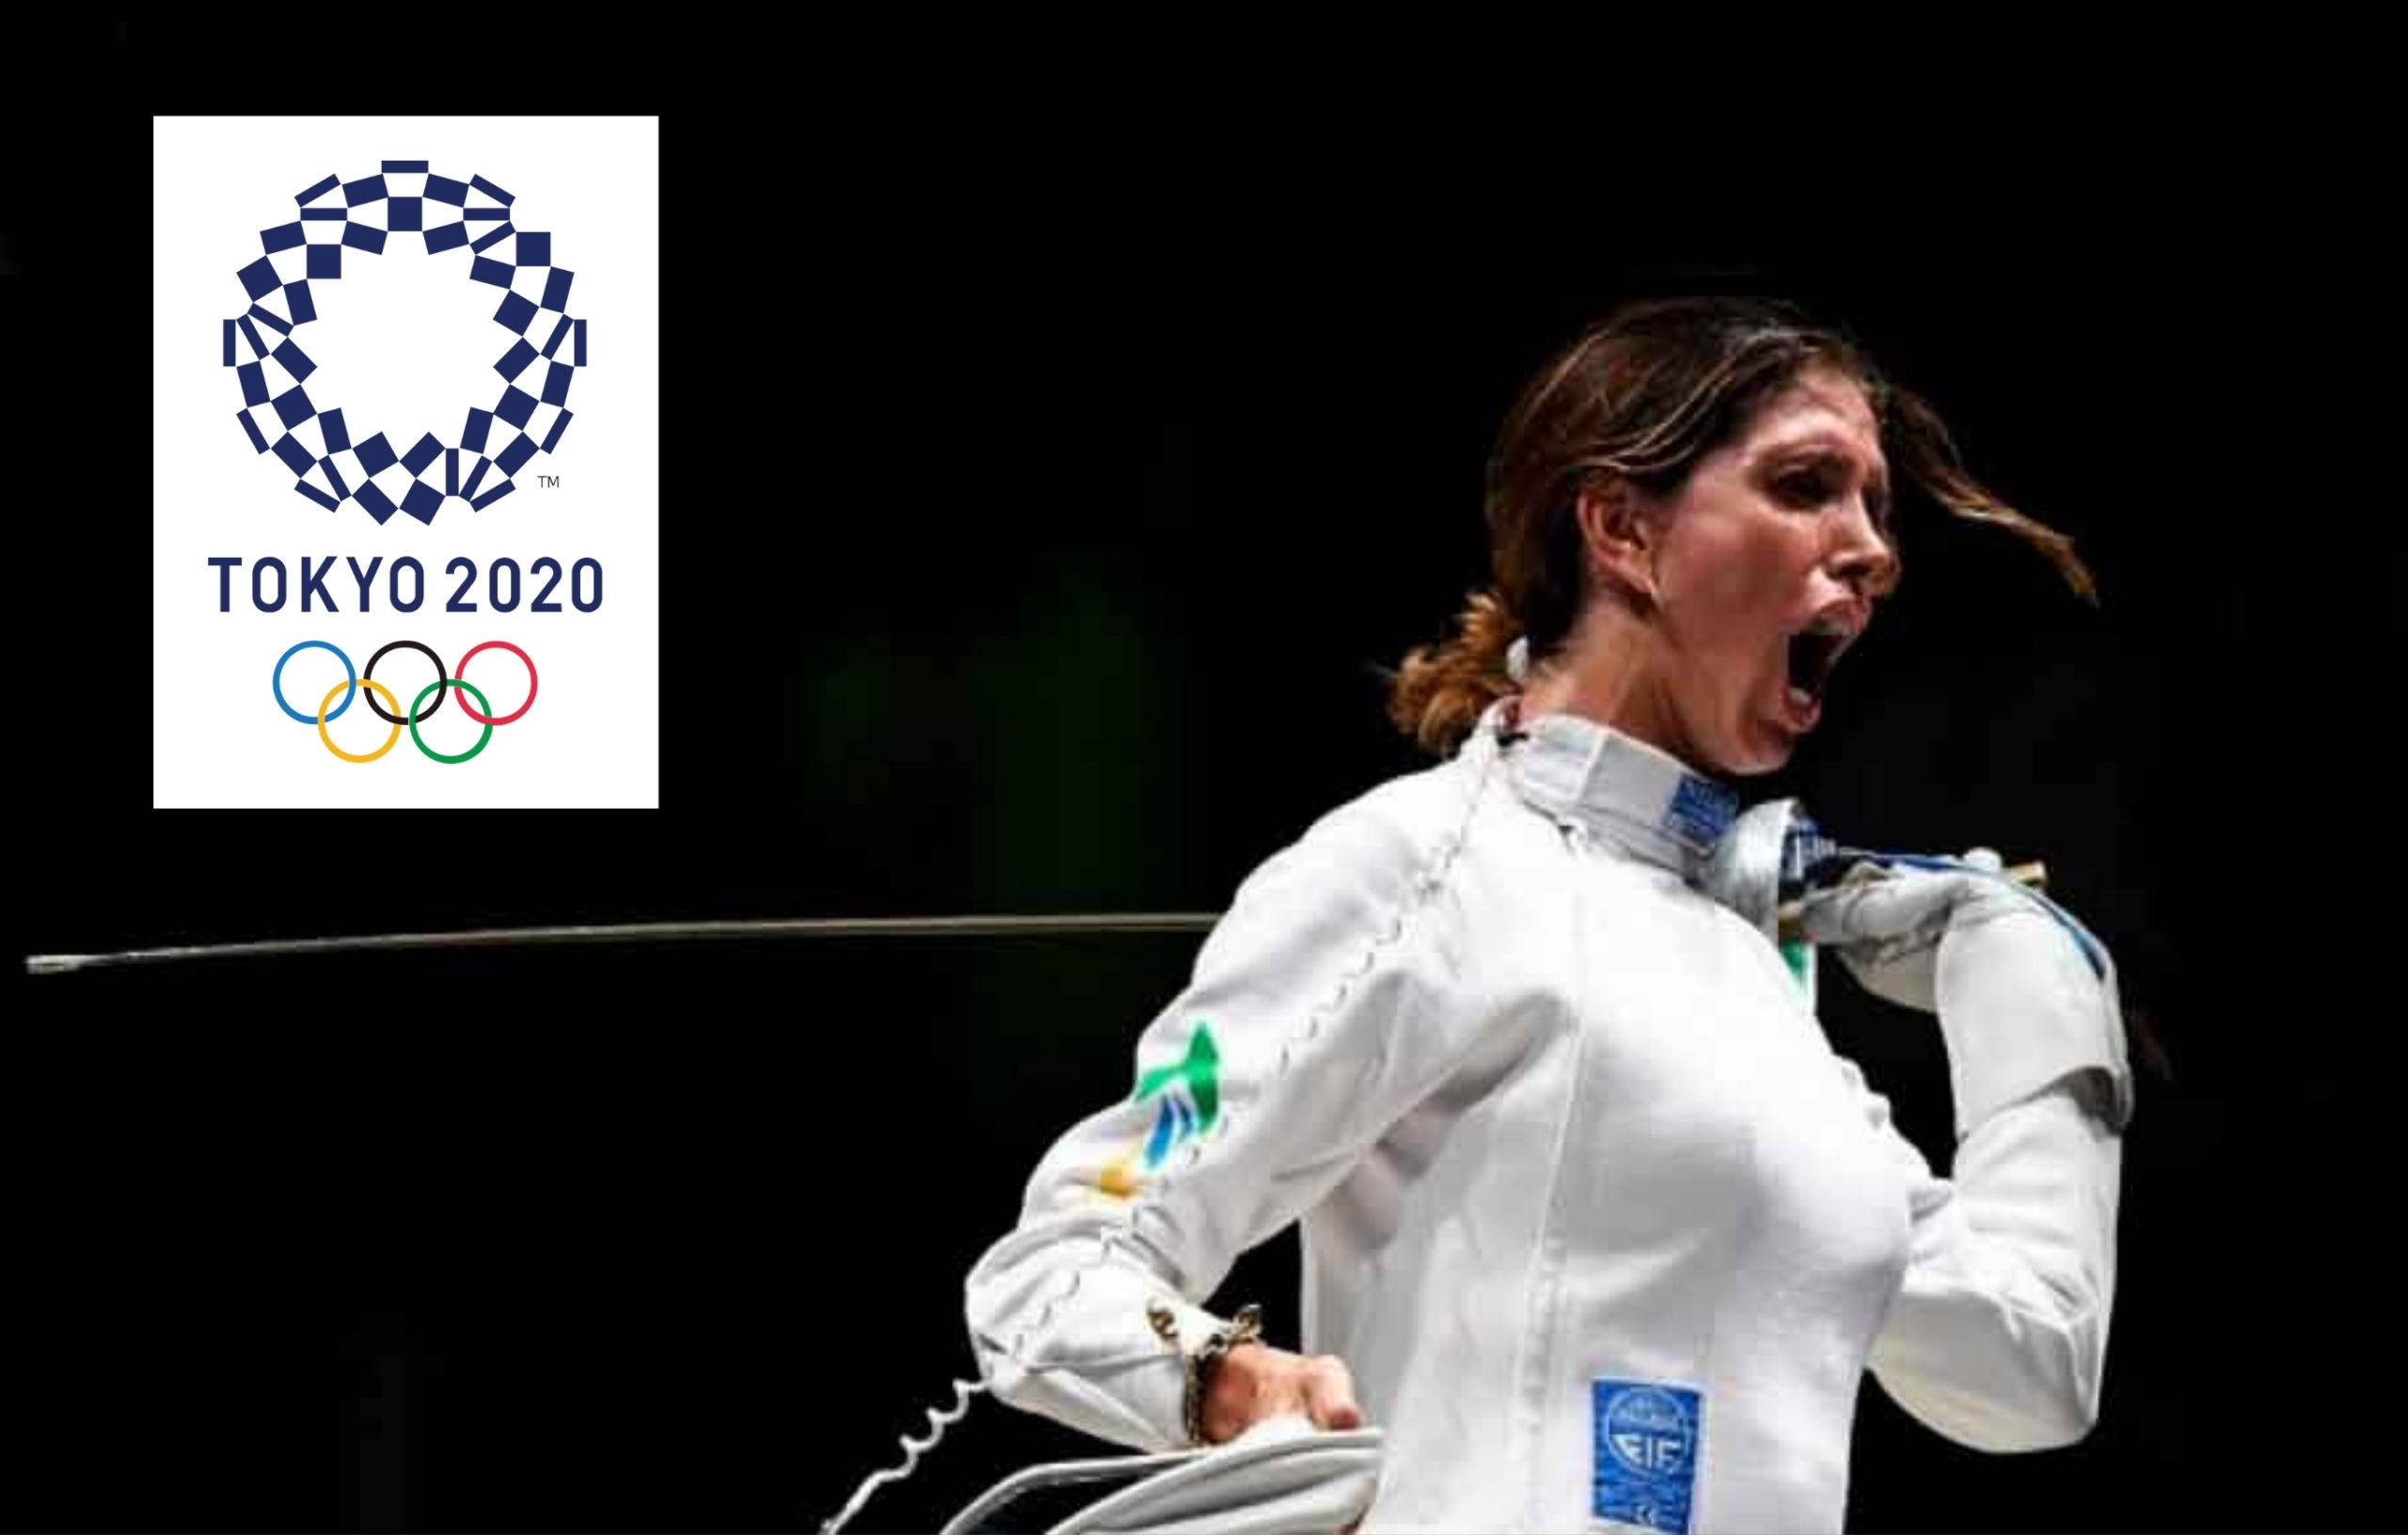 Guilherme Toldo e Nathalie Moelhausen realizam treinamentos na Vila Olímpica